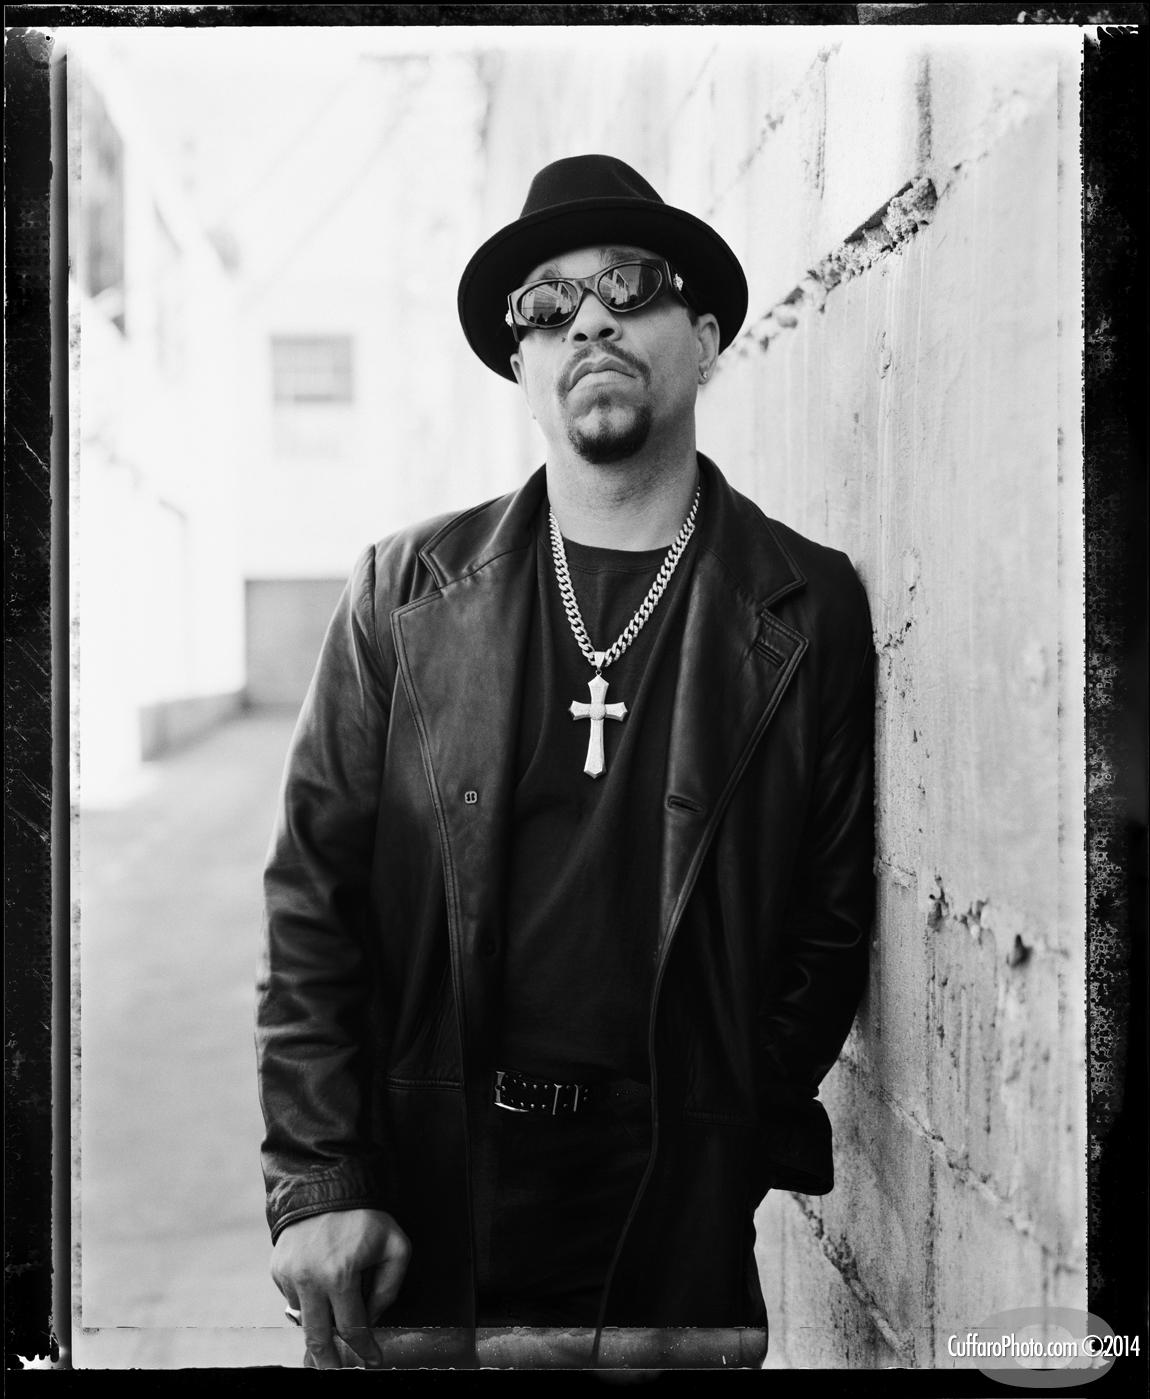 Ice T by Chris Cuffaro